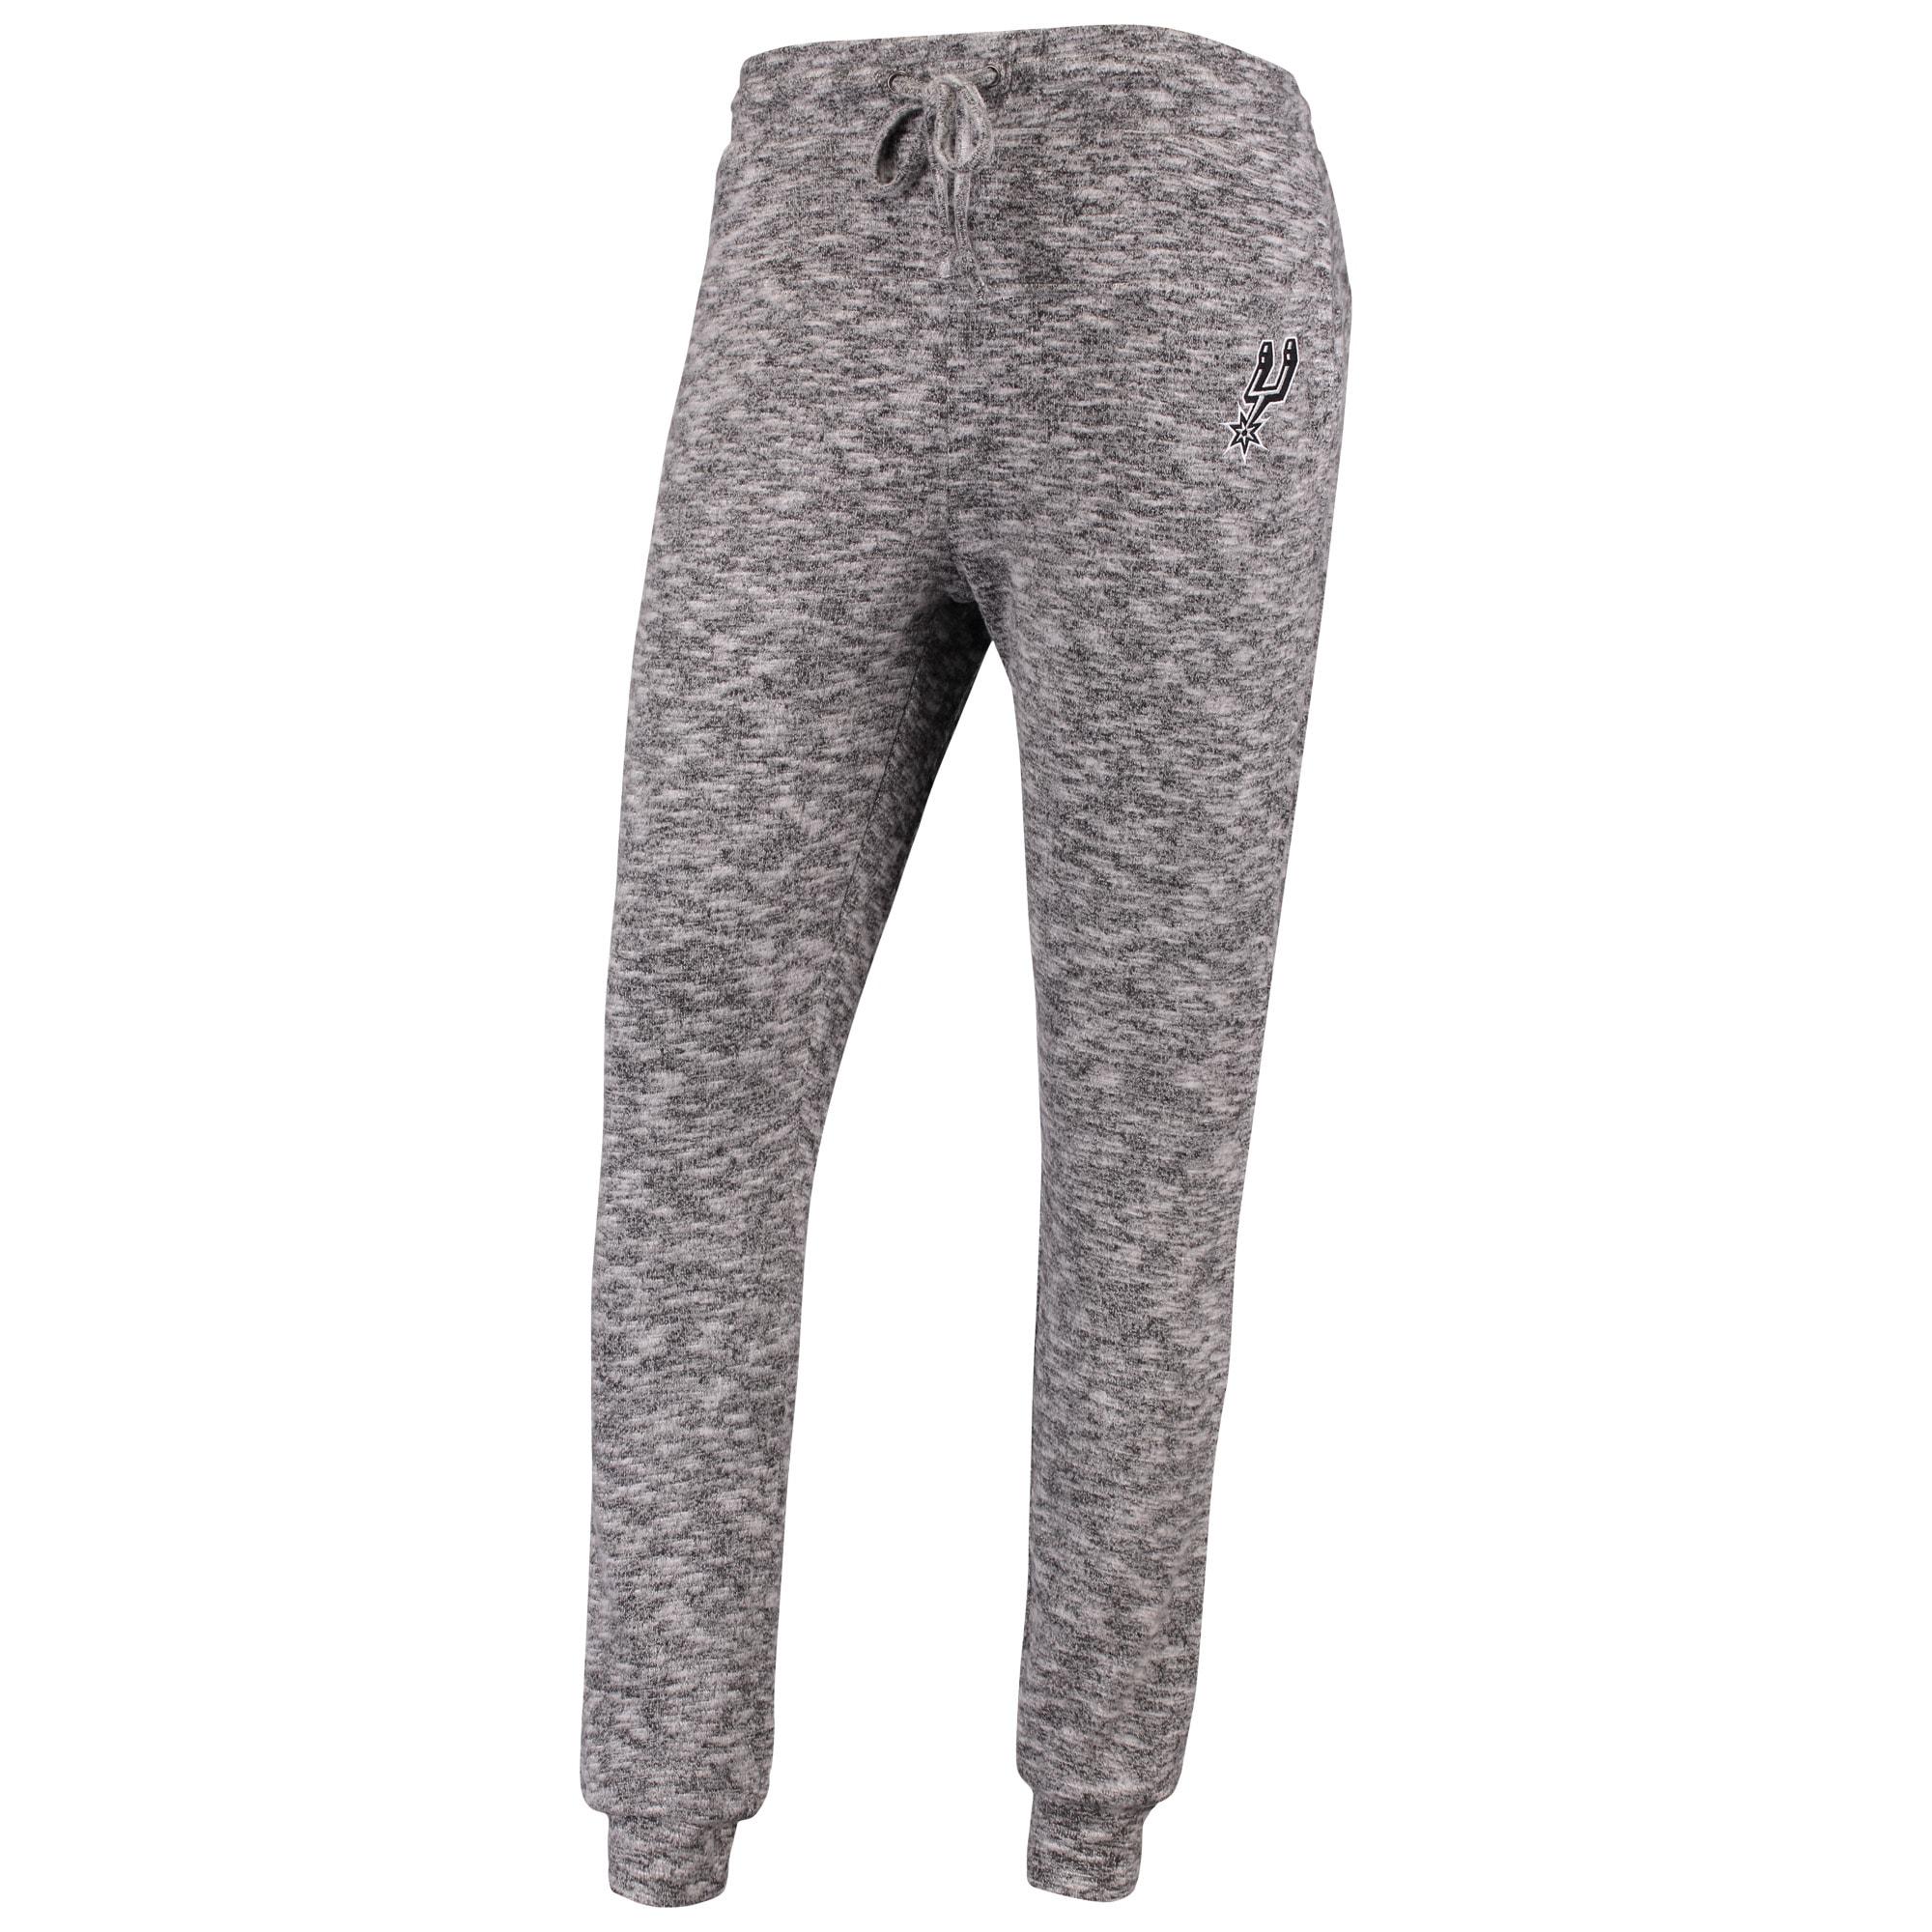 San Antonio Spurs Women's Hacci Tri-Blend Jogger Pants - Heathered Gray